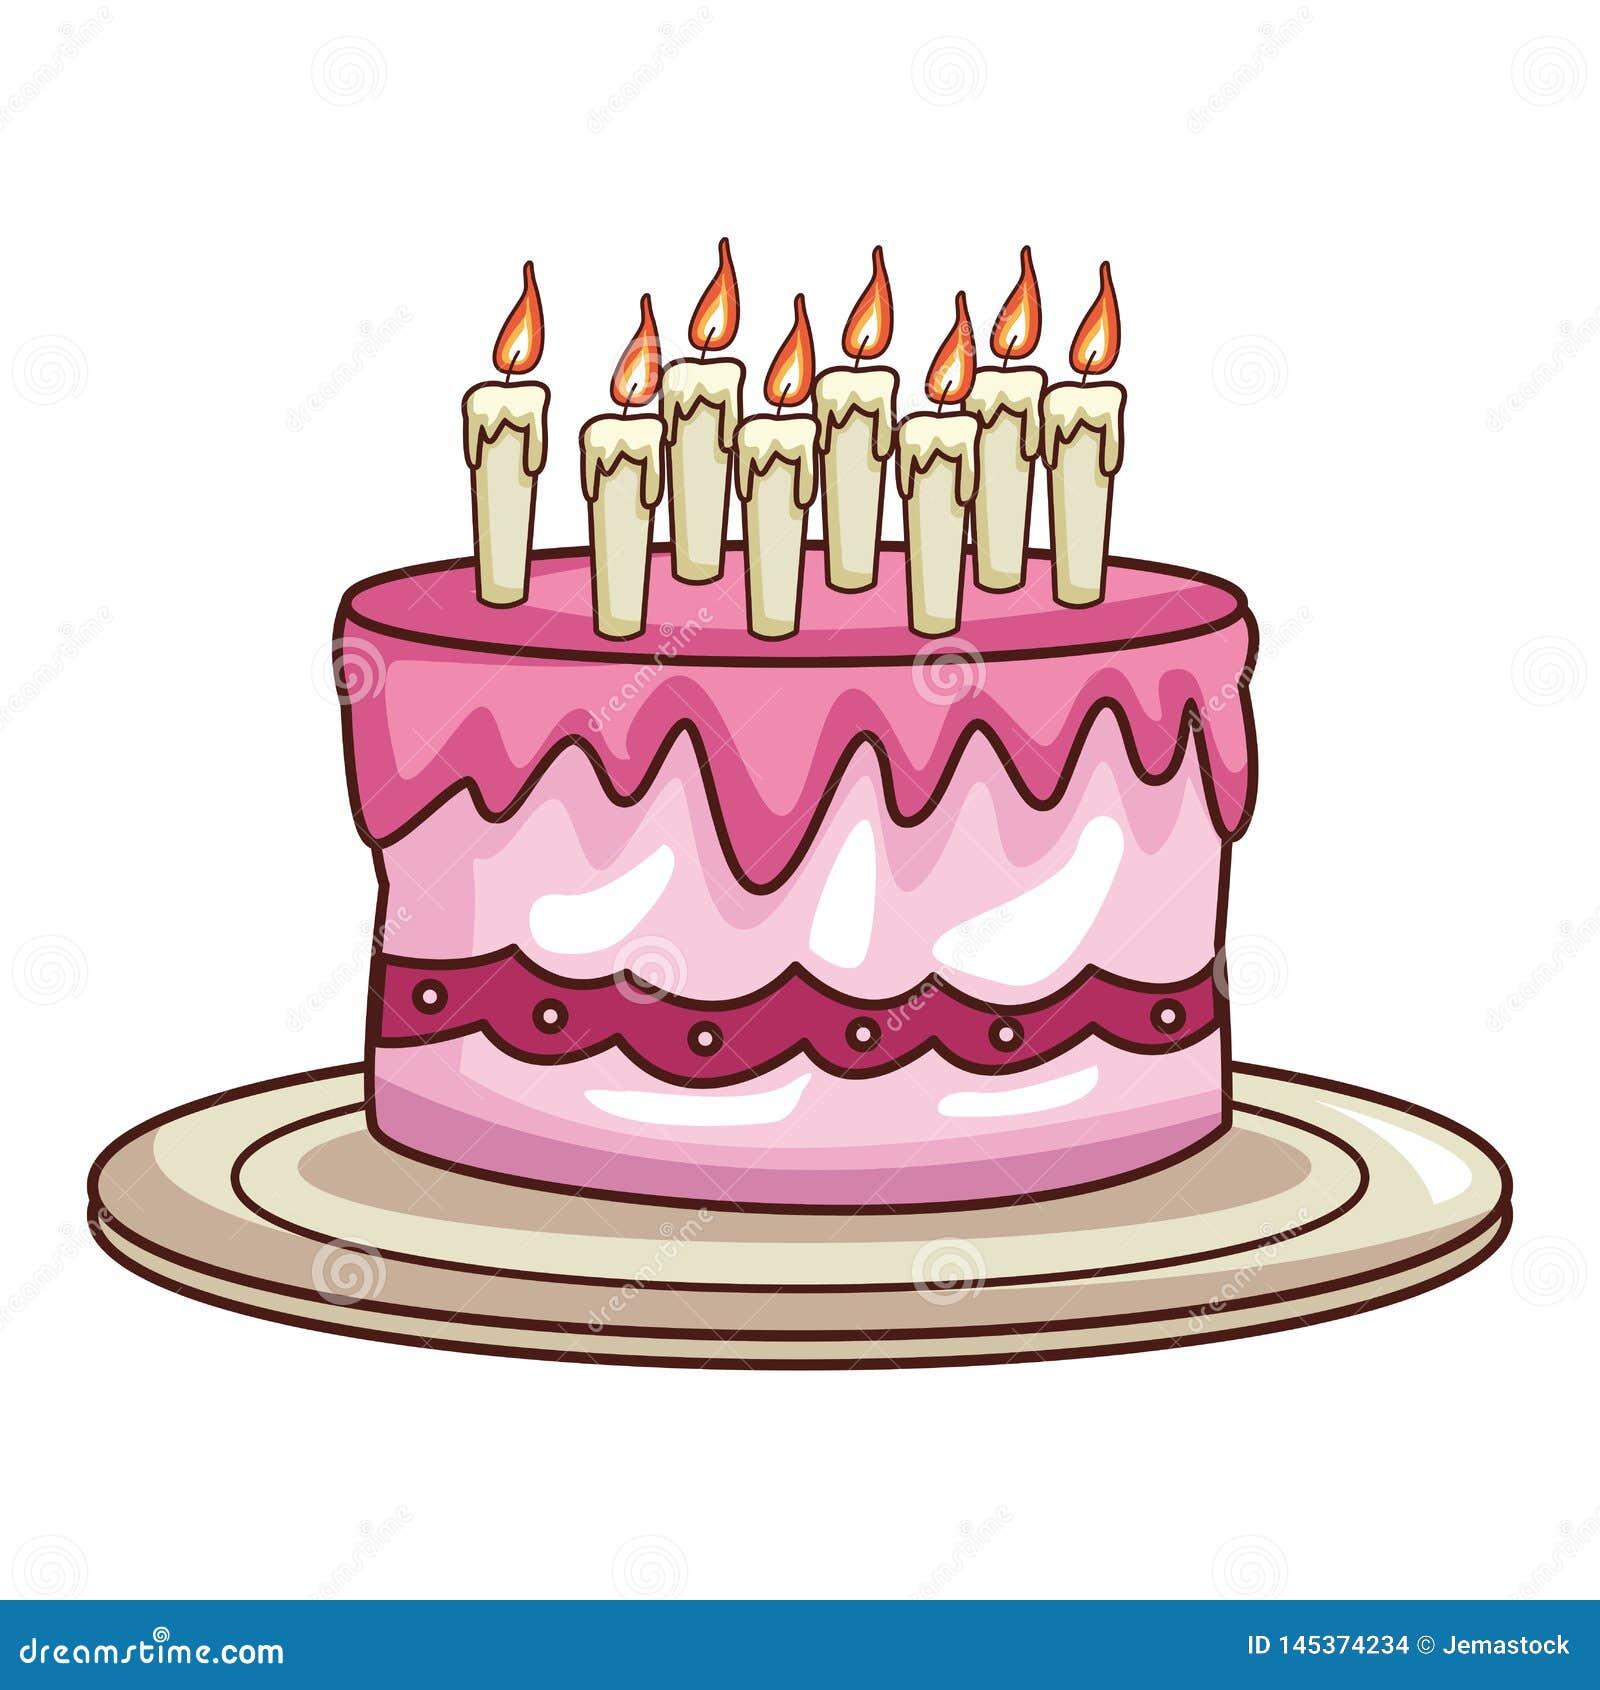 Birthday Cake Cartoon Stock Vector Illustration Of Drawing 145374234